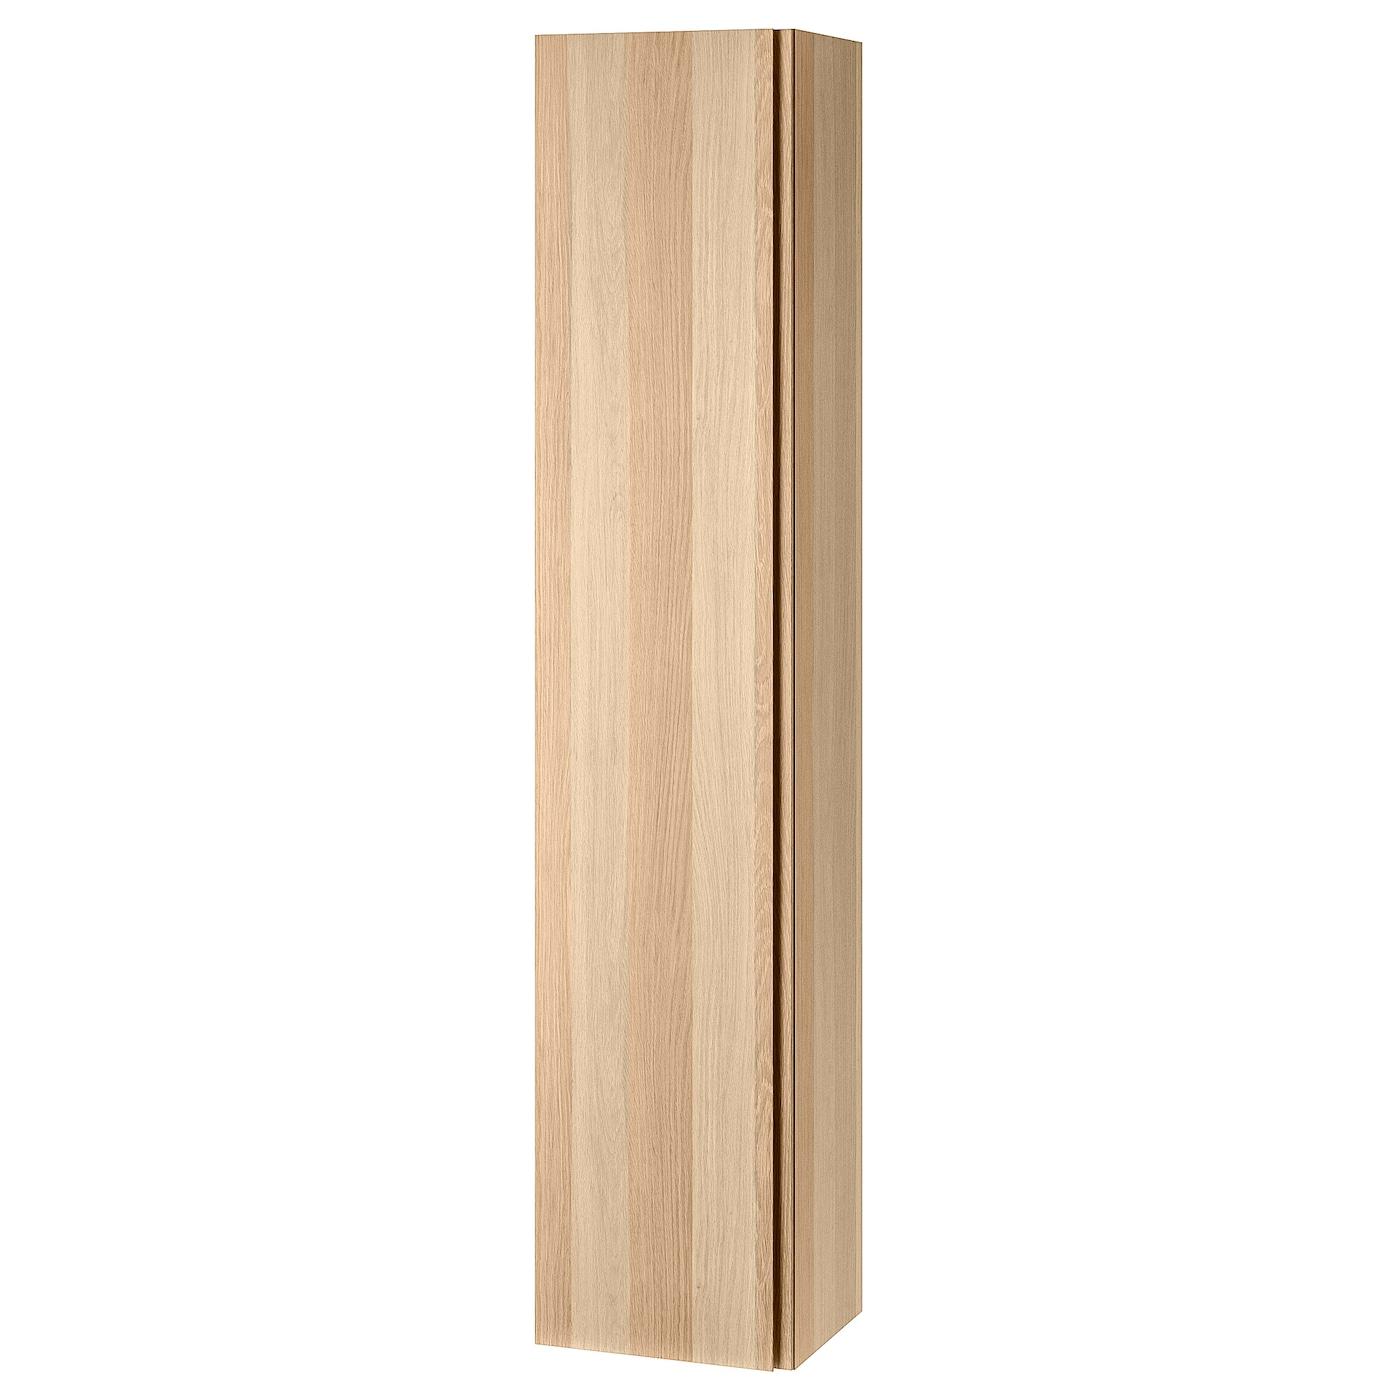 GODMORGON Colonne - effet chêne blanchi 15x15x15 cm